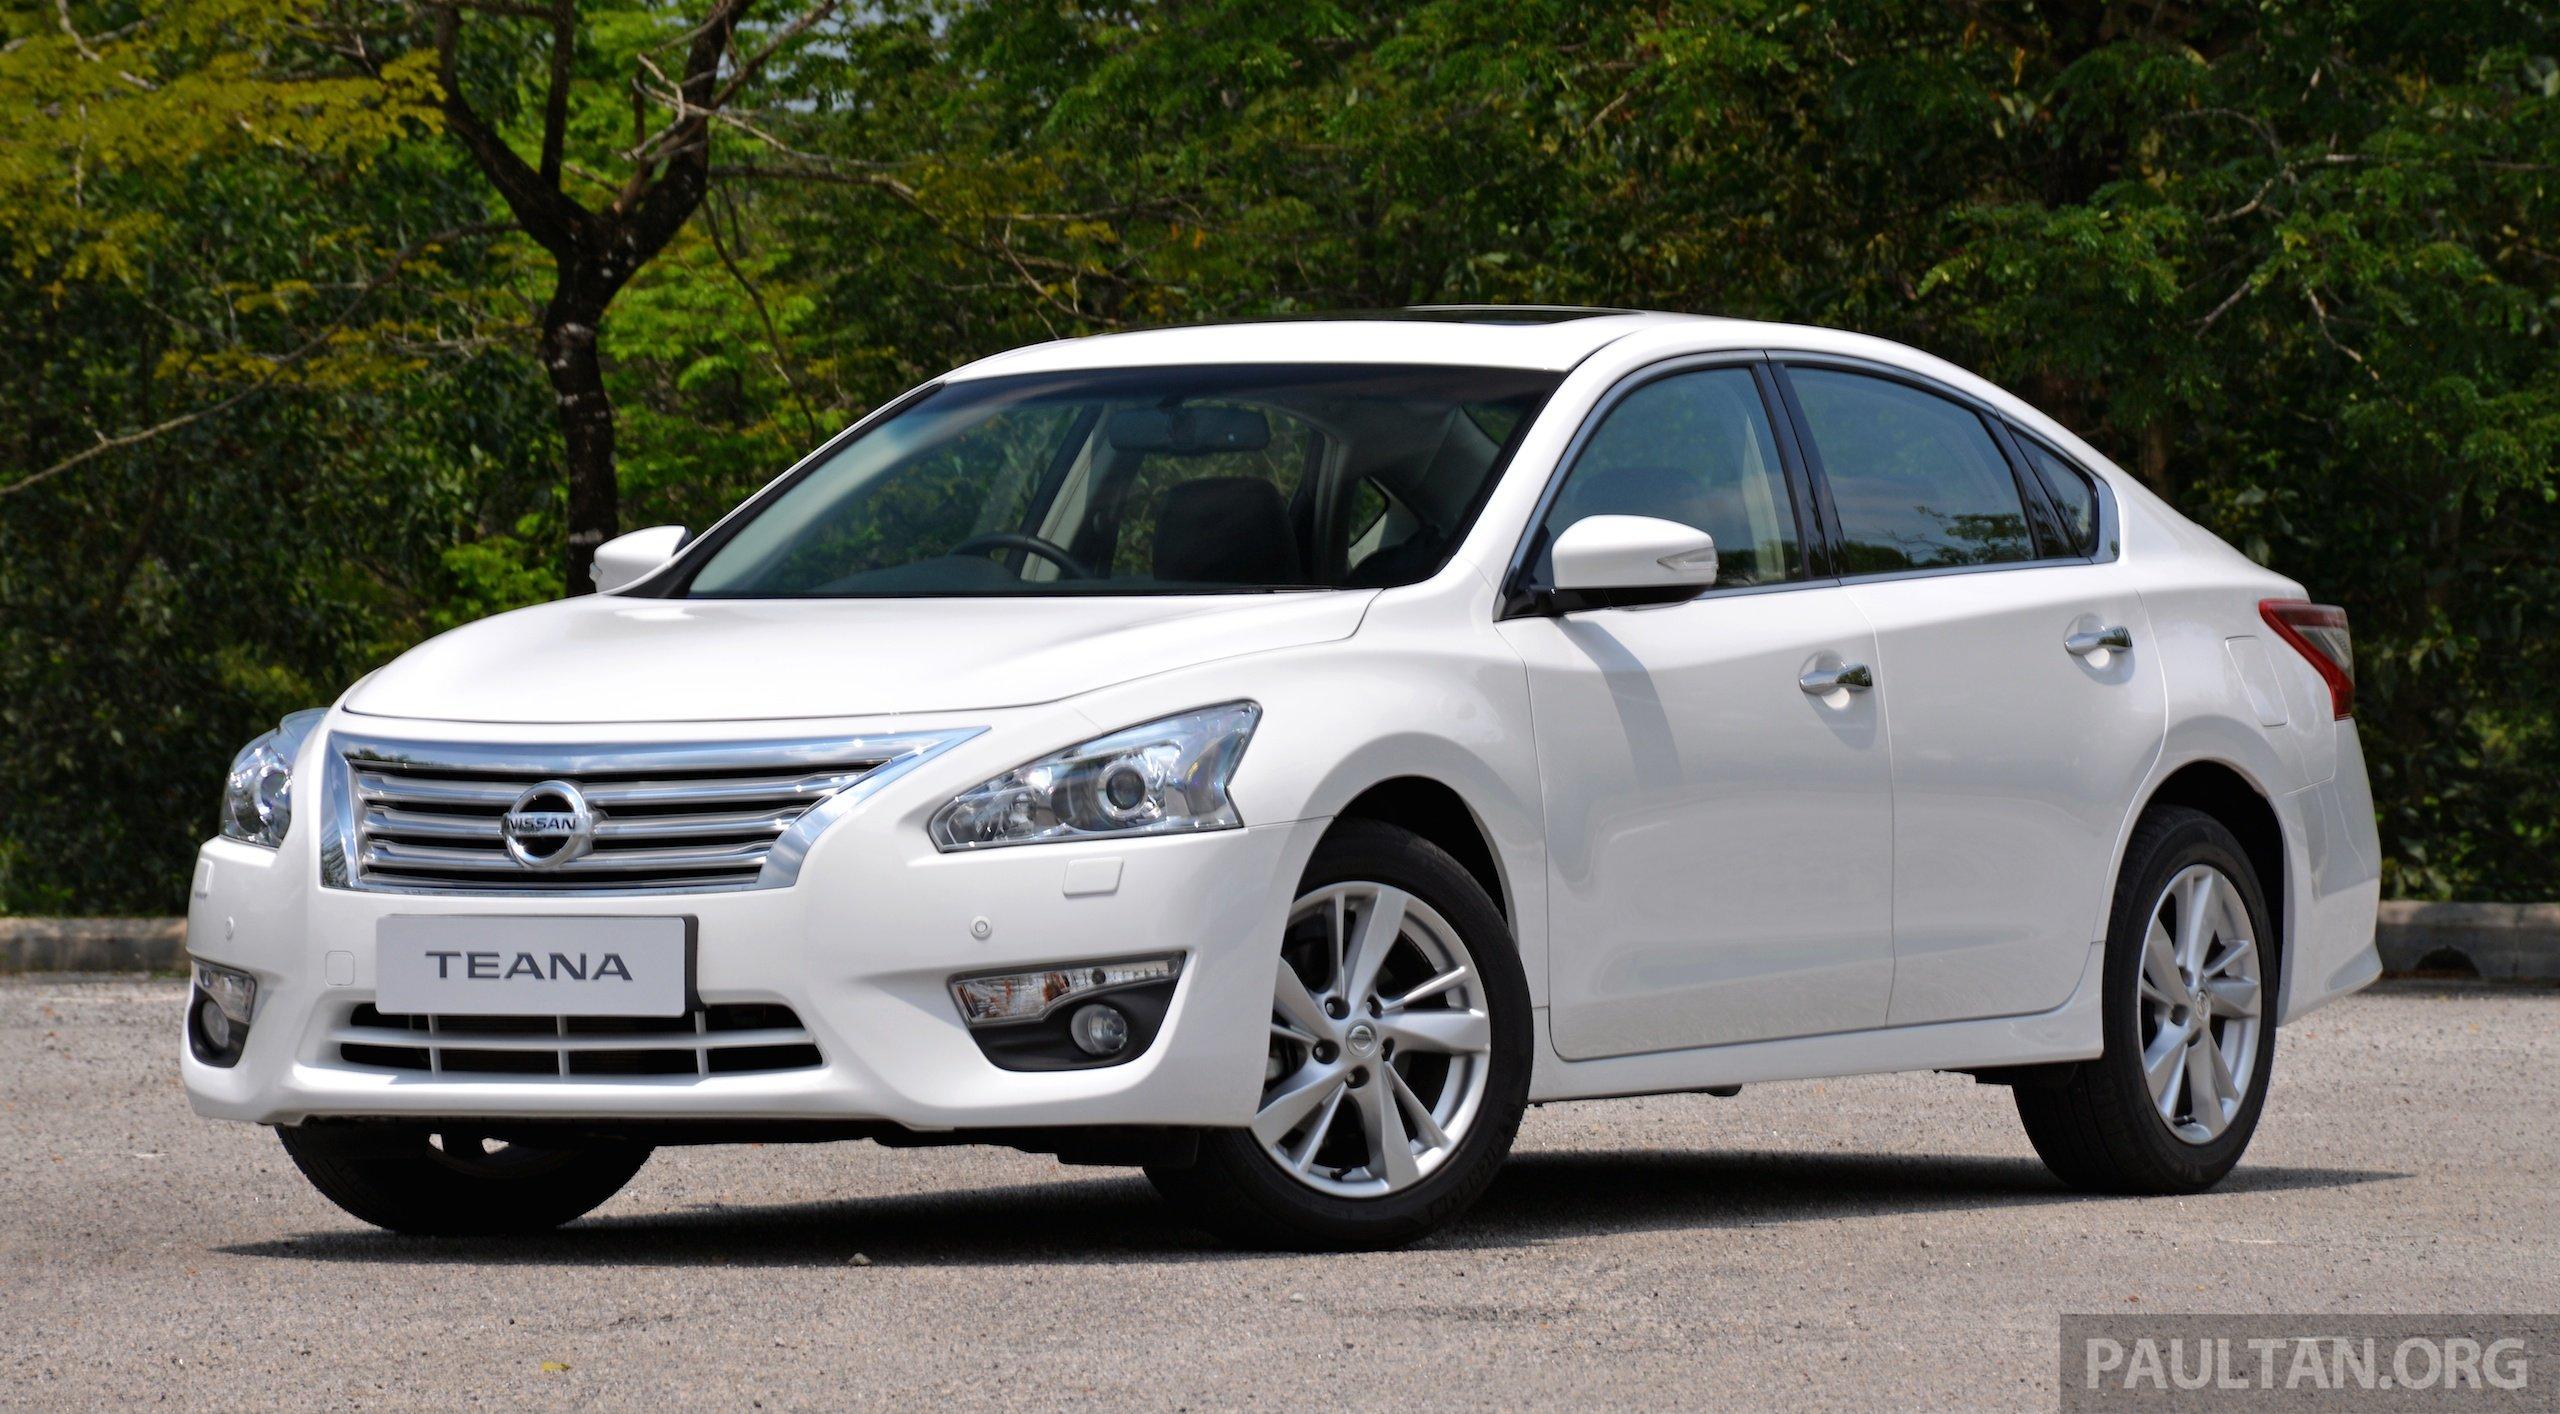 DRIVEN: 2014 Nissan Teana Ups The D-segment Ante